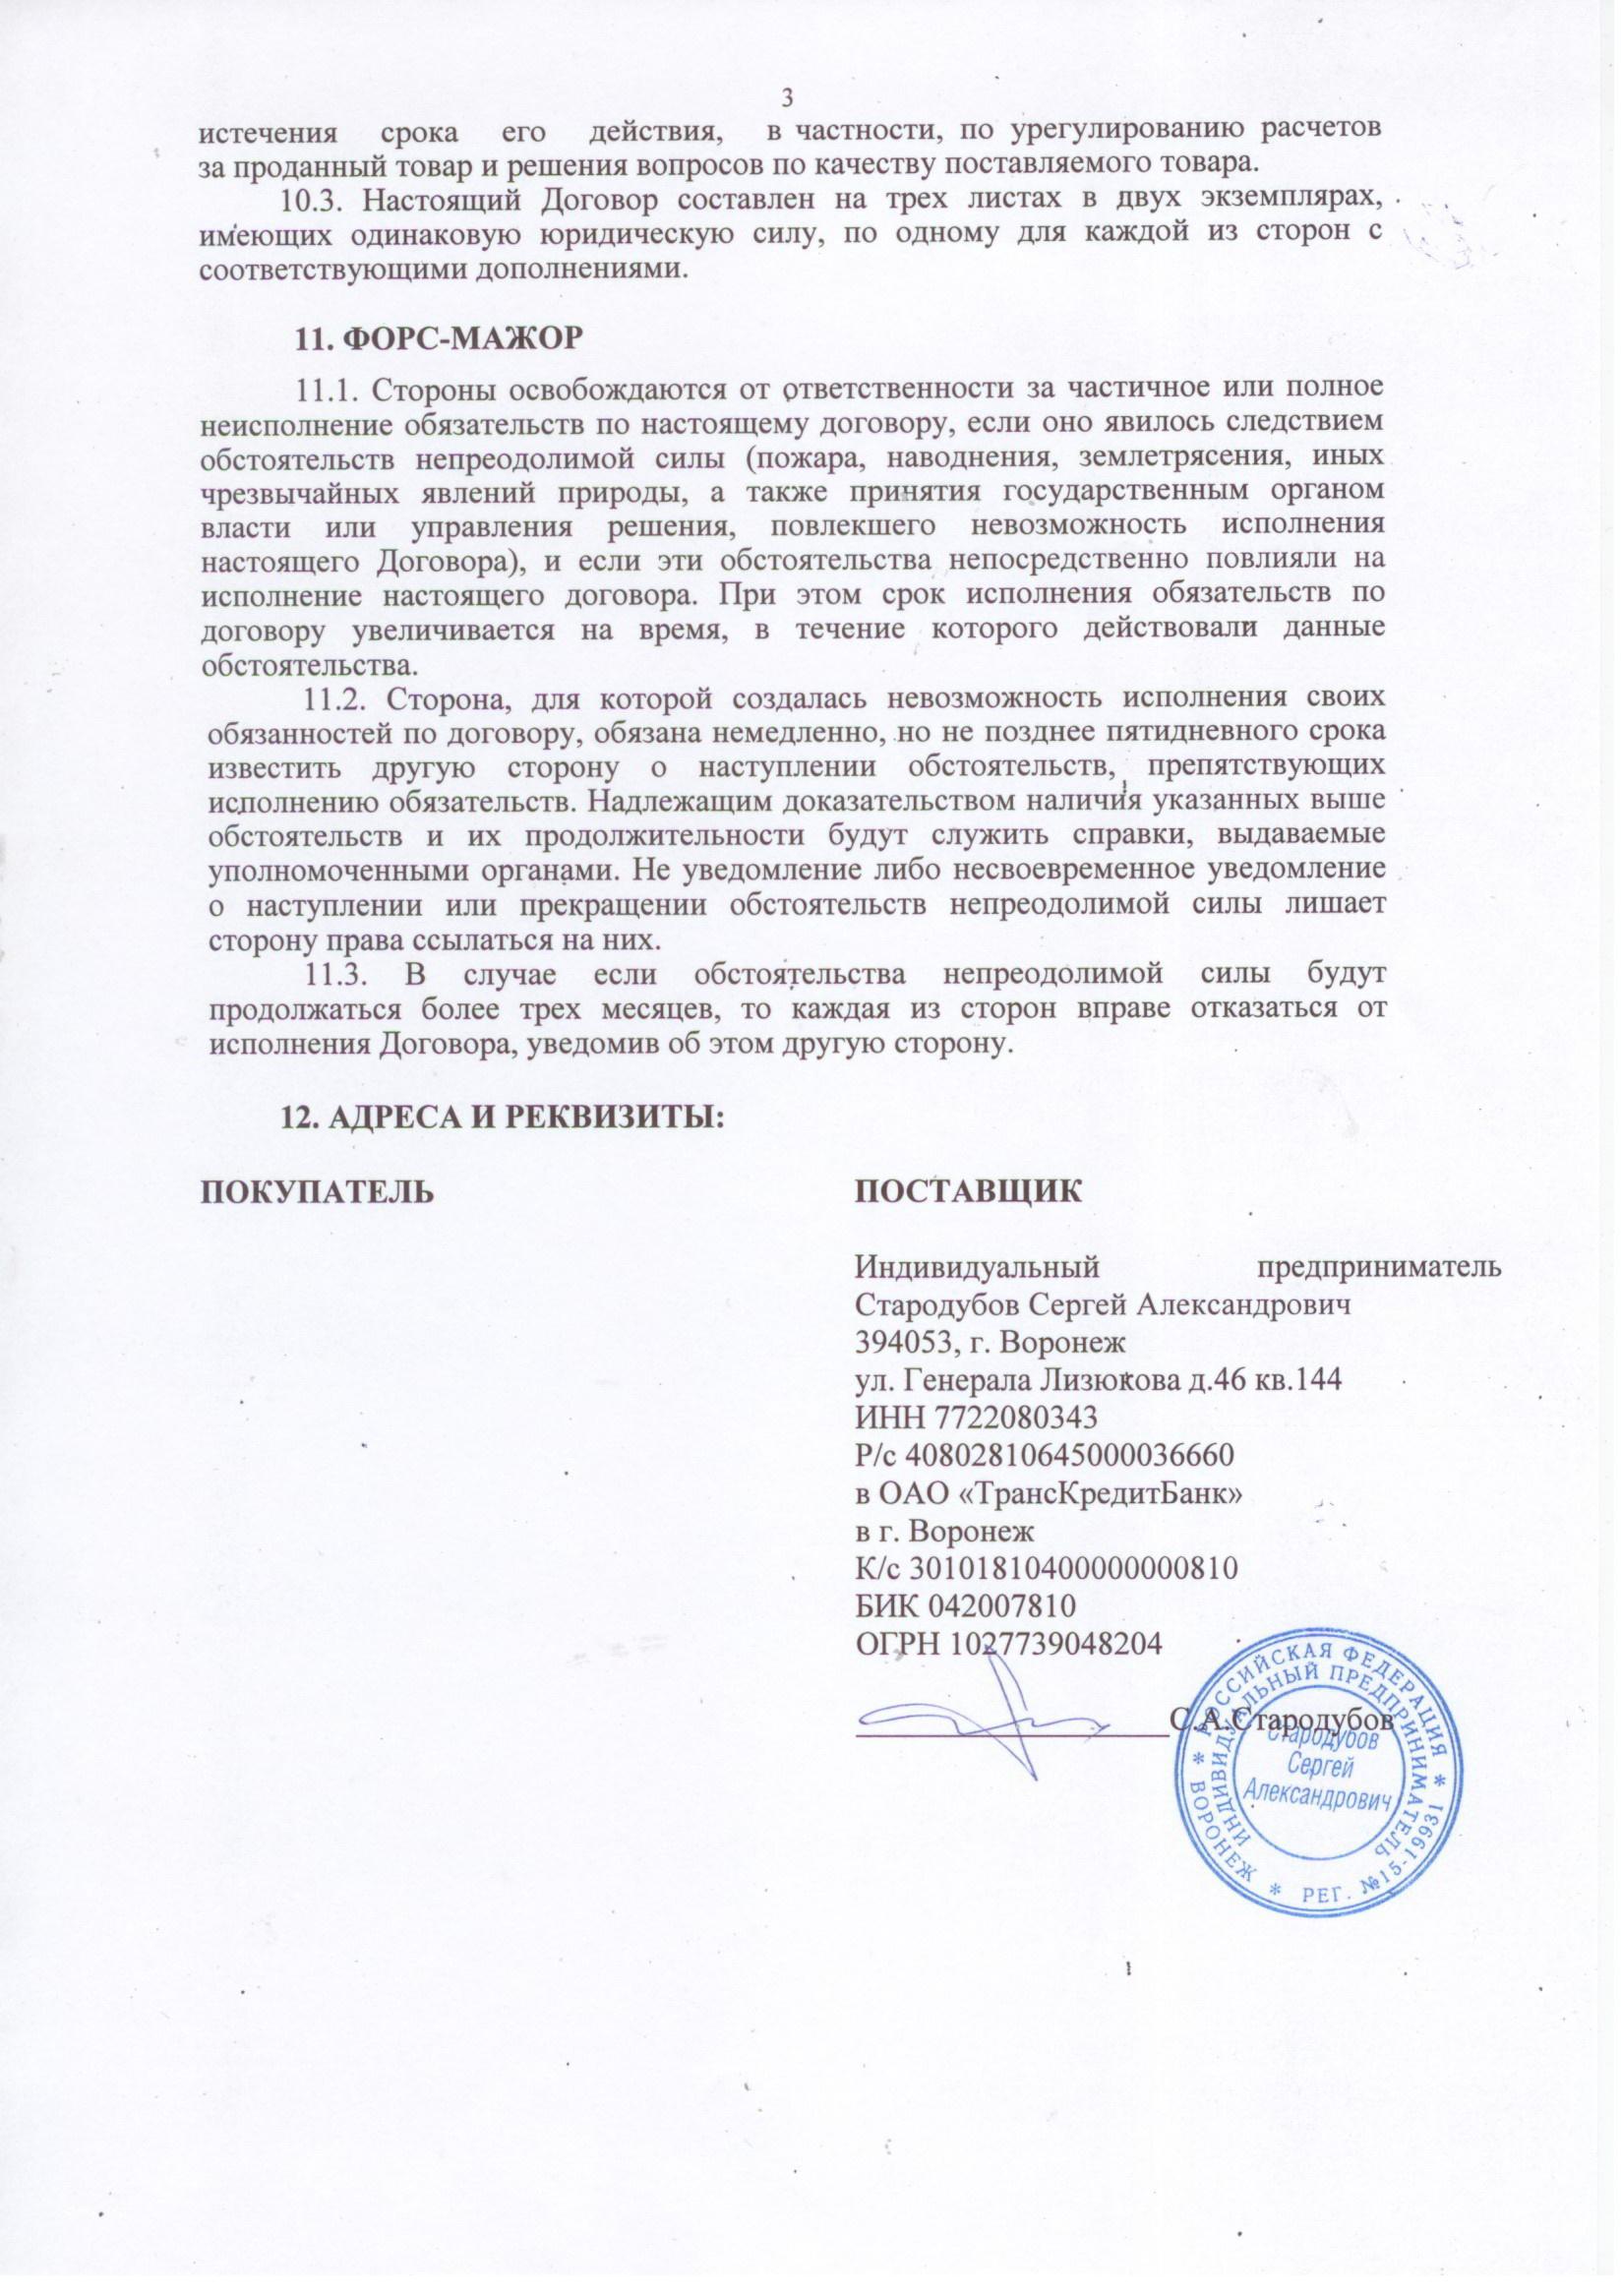 Договор подпись на каждом листе Диаспаре температура